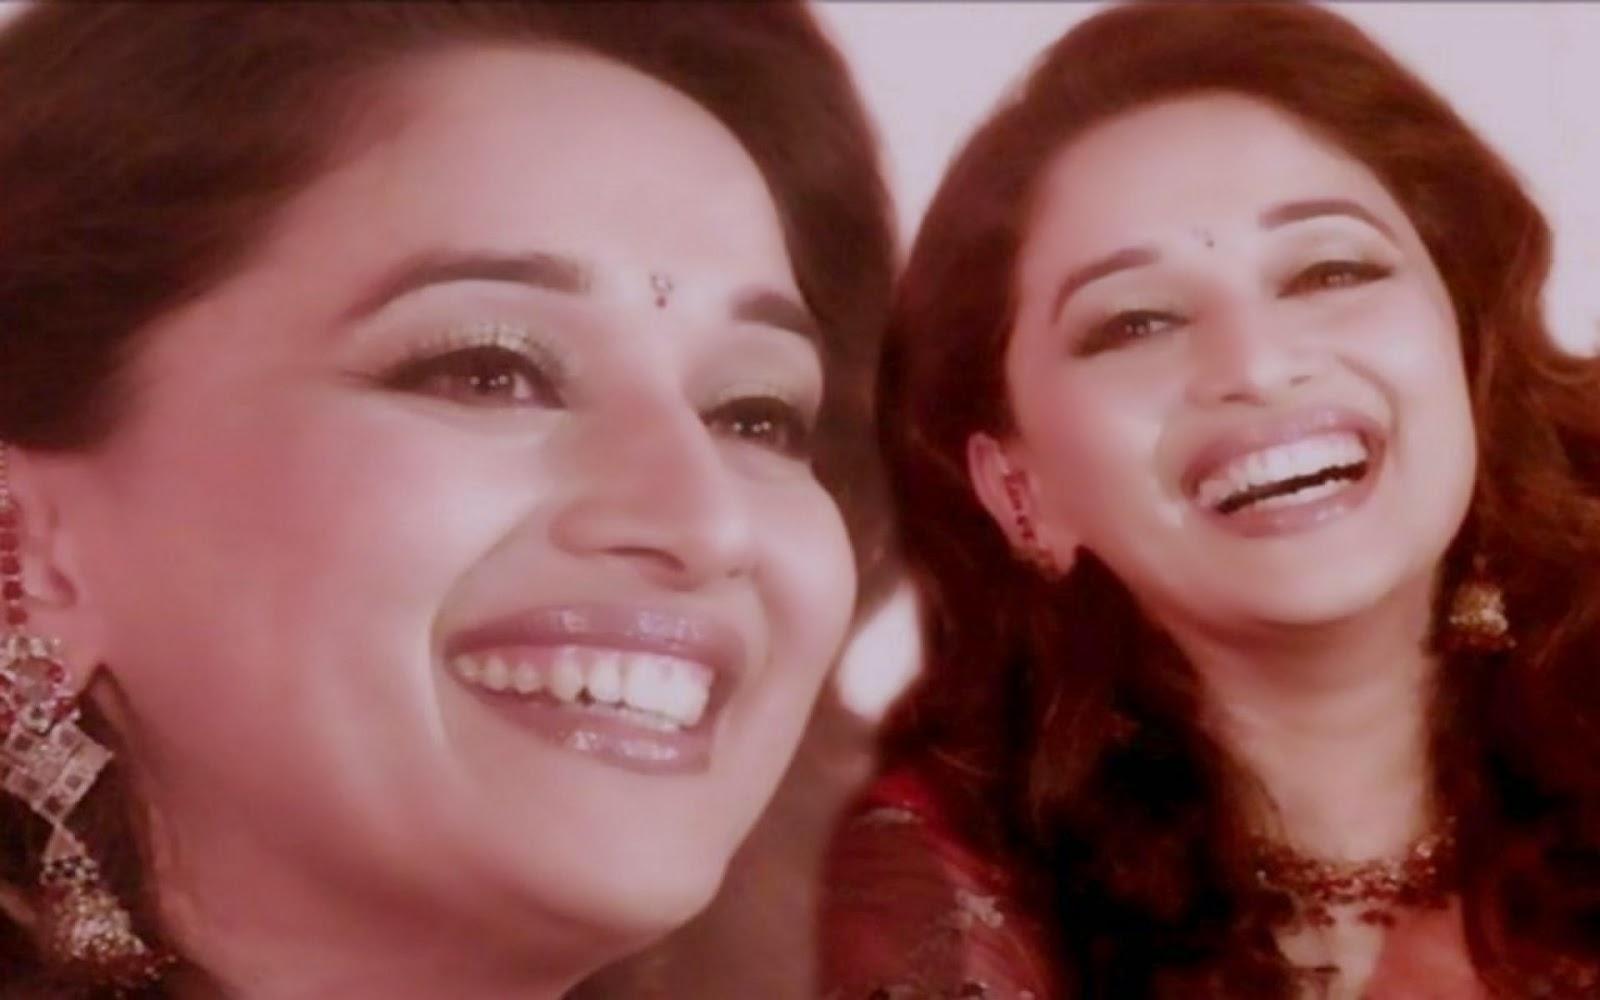 Smiling Face Maduri Dixi HD Wallpaper Free Download